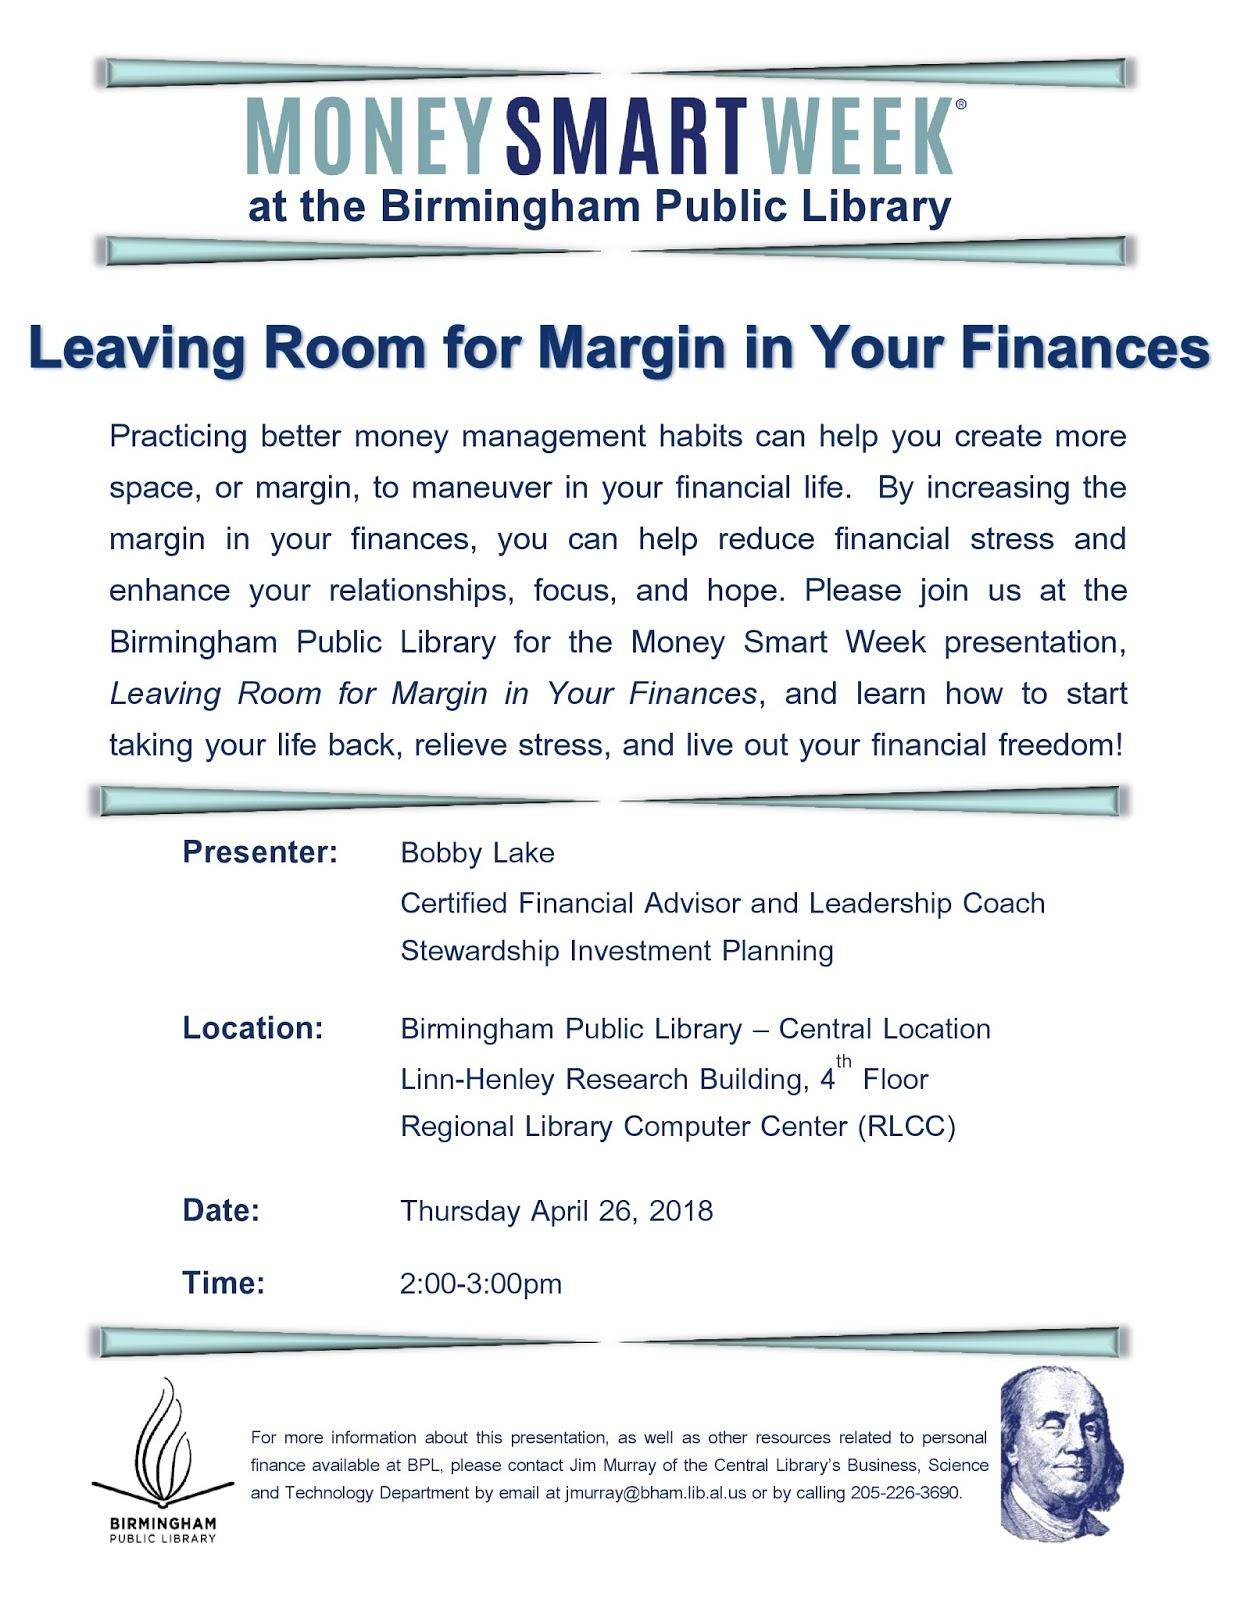 Birmingham Public Library: Celebrate Money Smart Week at the